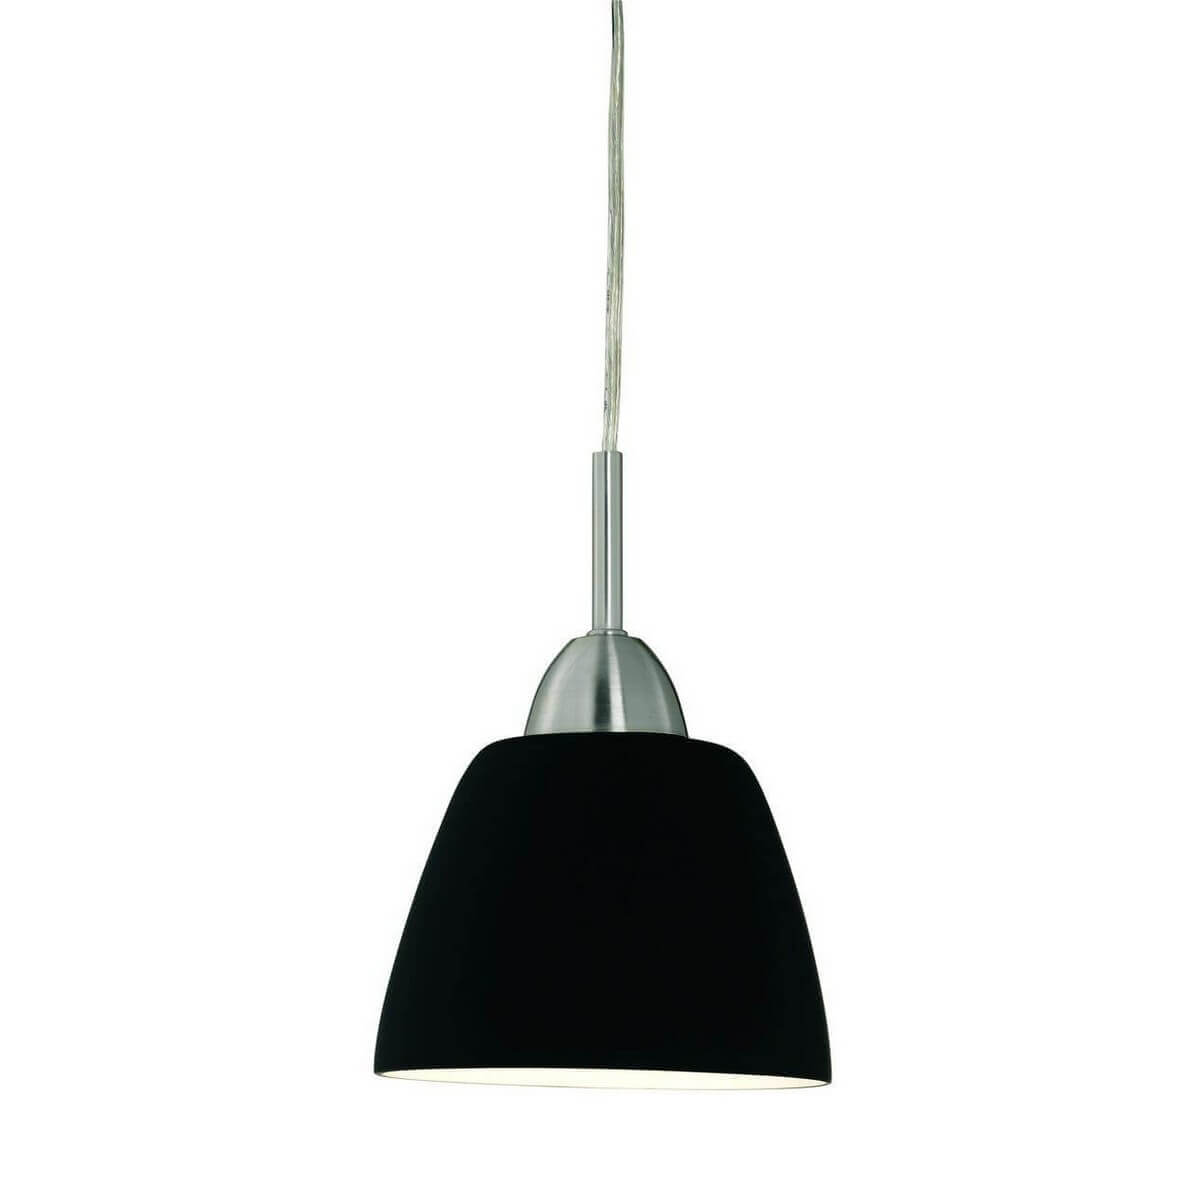 цена на Светильник Markslojd 195941-455323 Brell